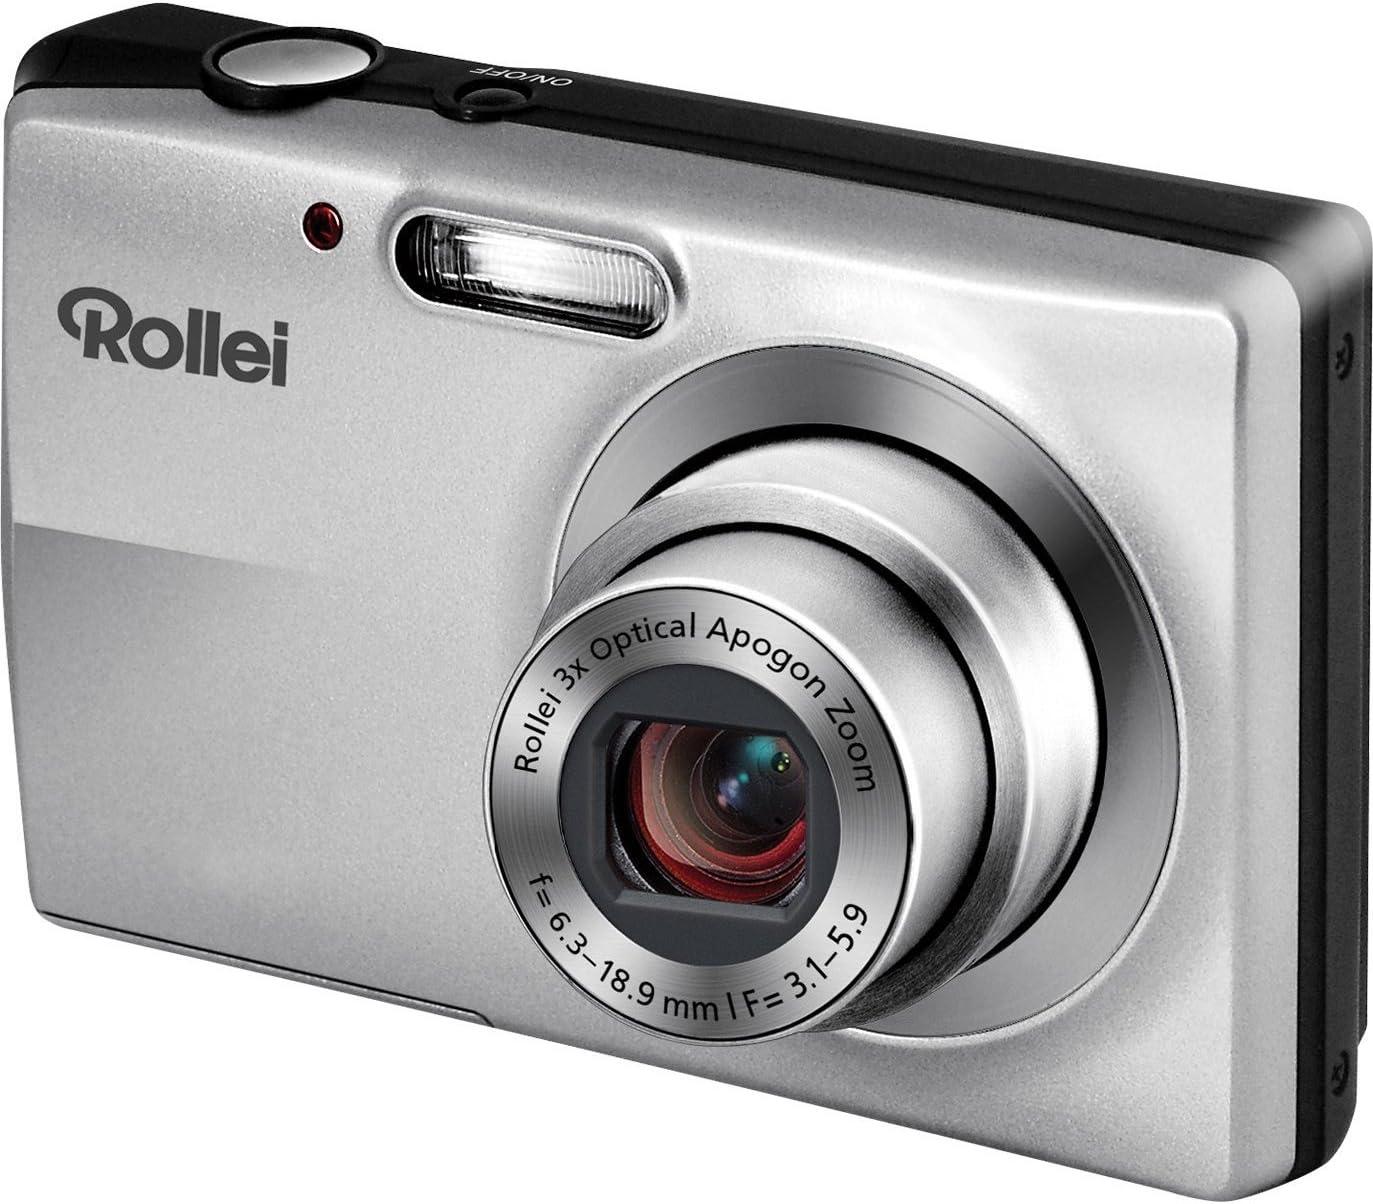 Rollei Compactline 412 Digitalkamera 2 4 Zoll Silber Kamera